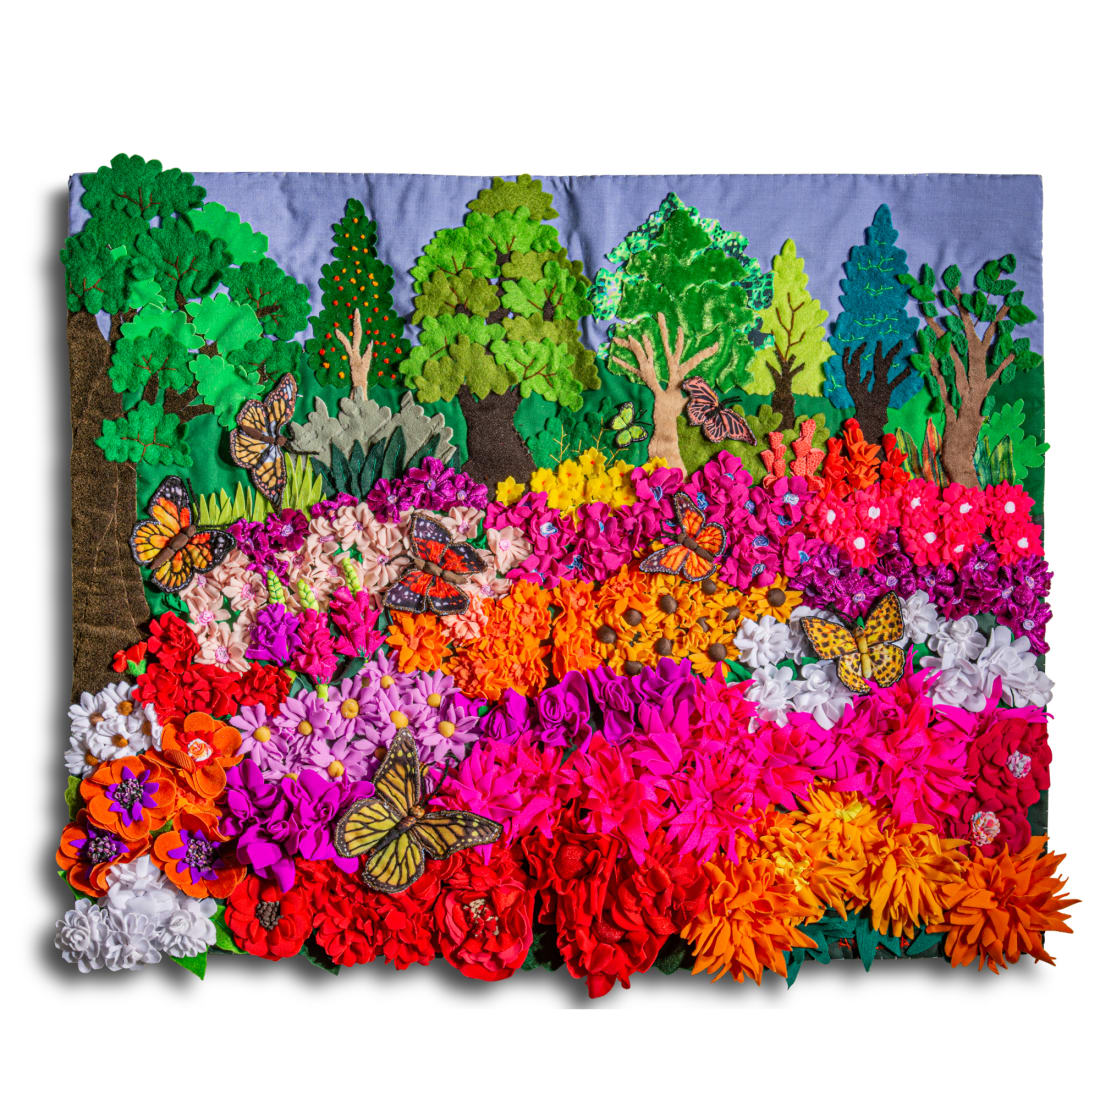 Colorful Flower Field - Medium